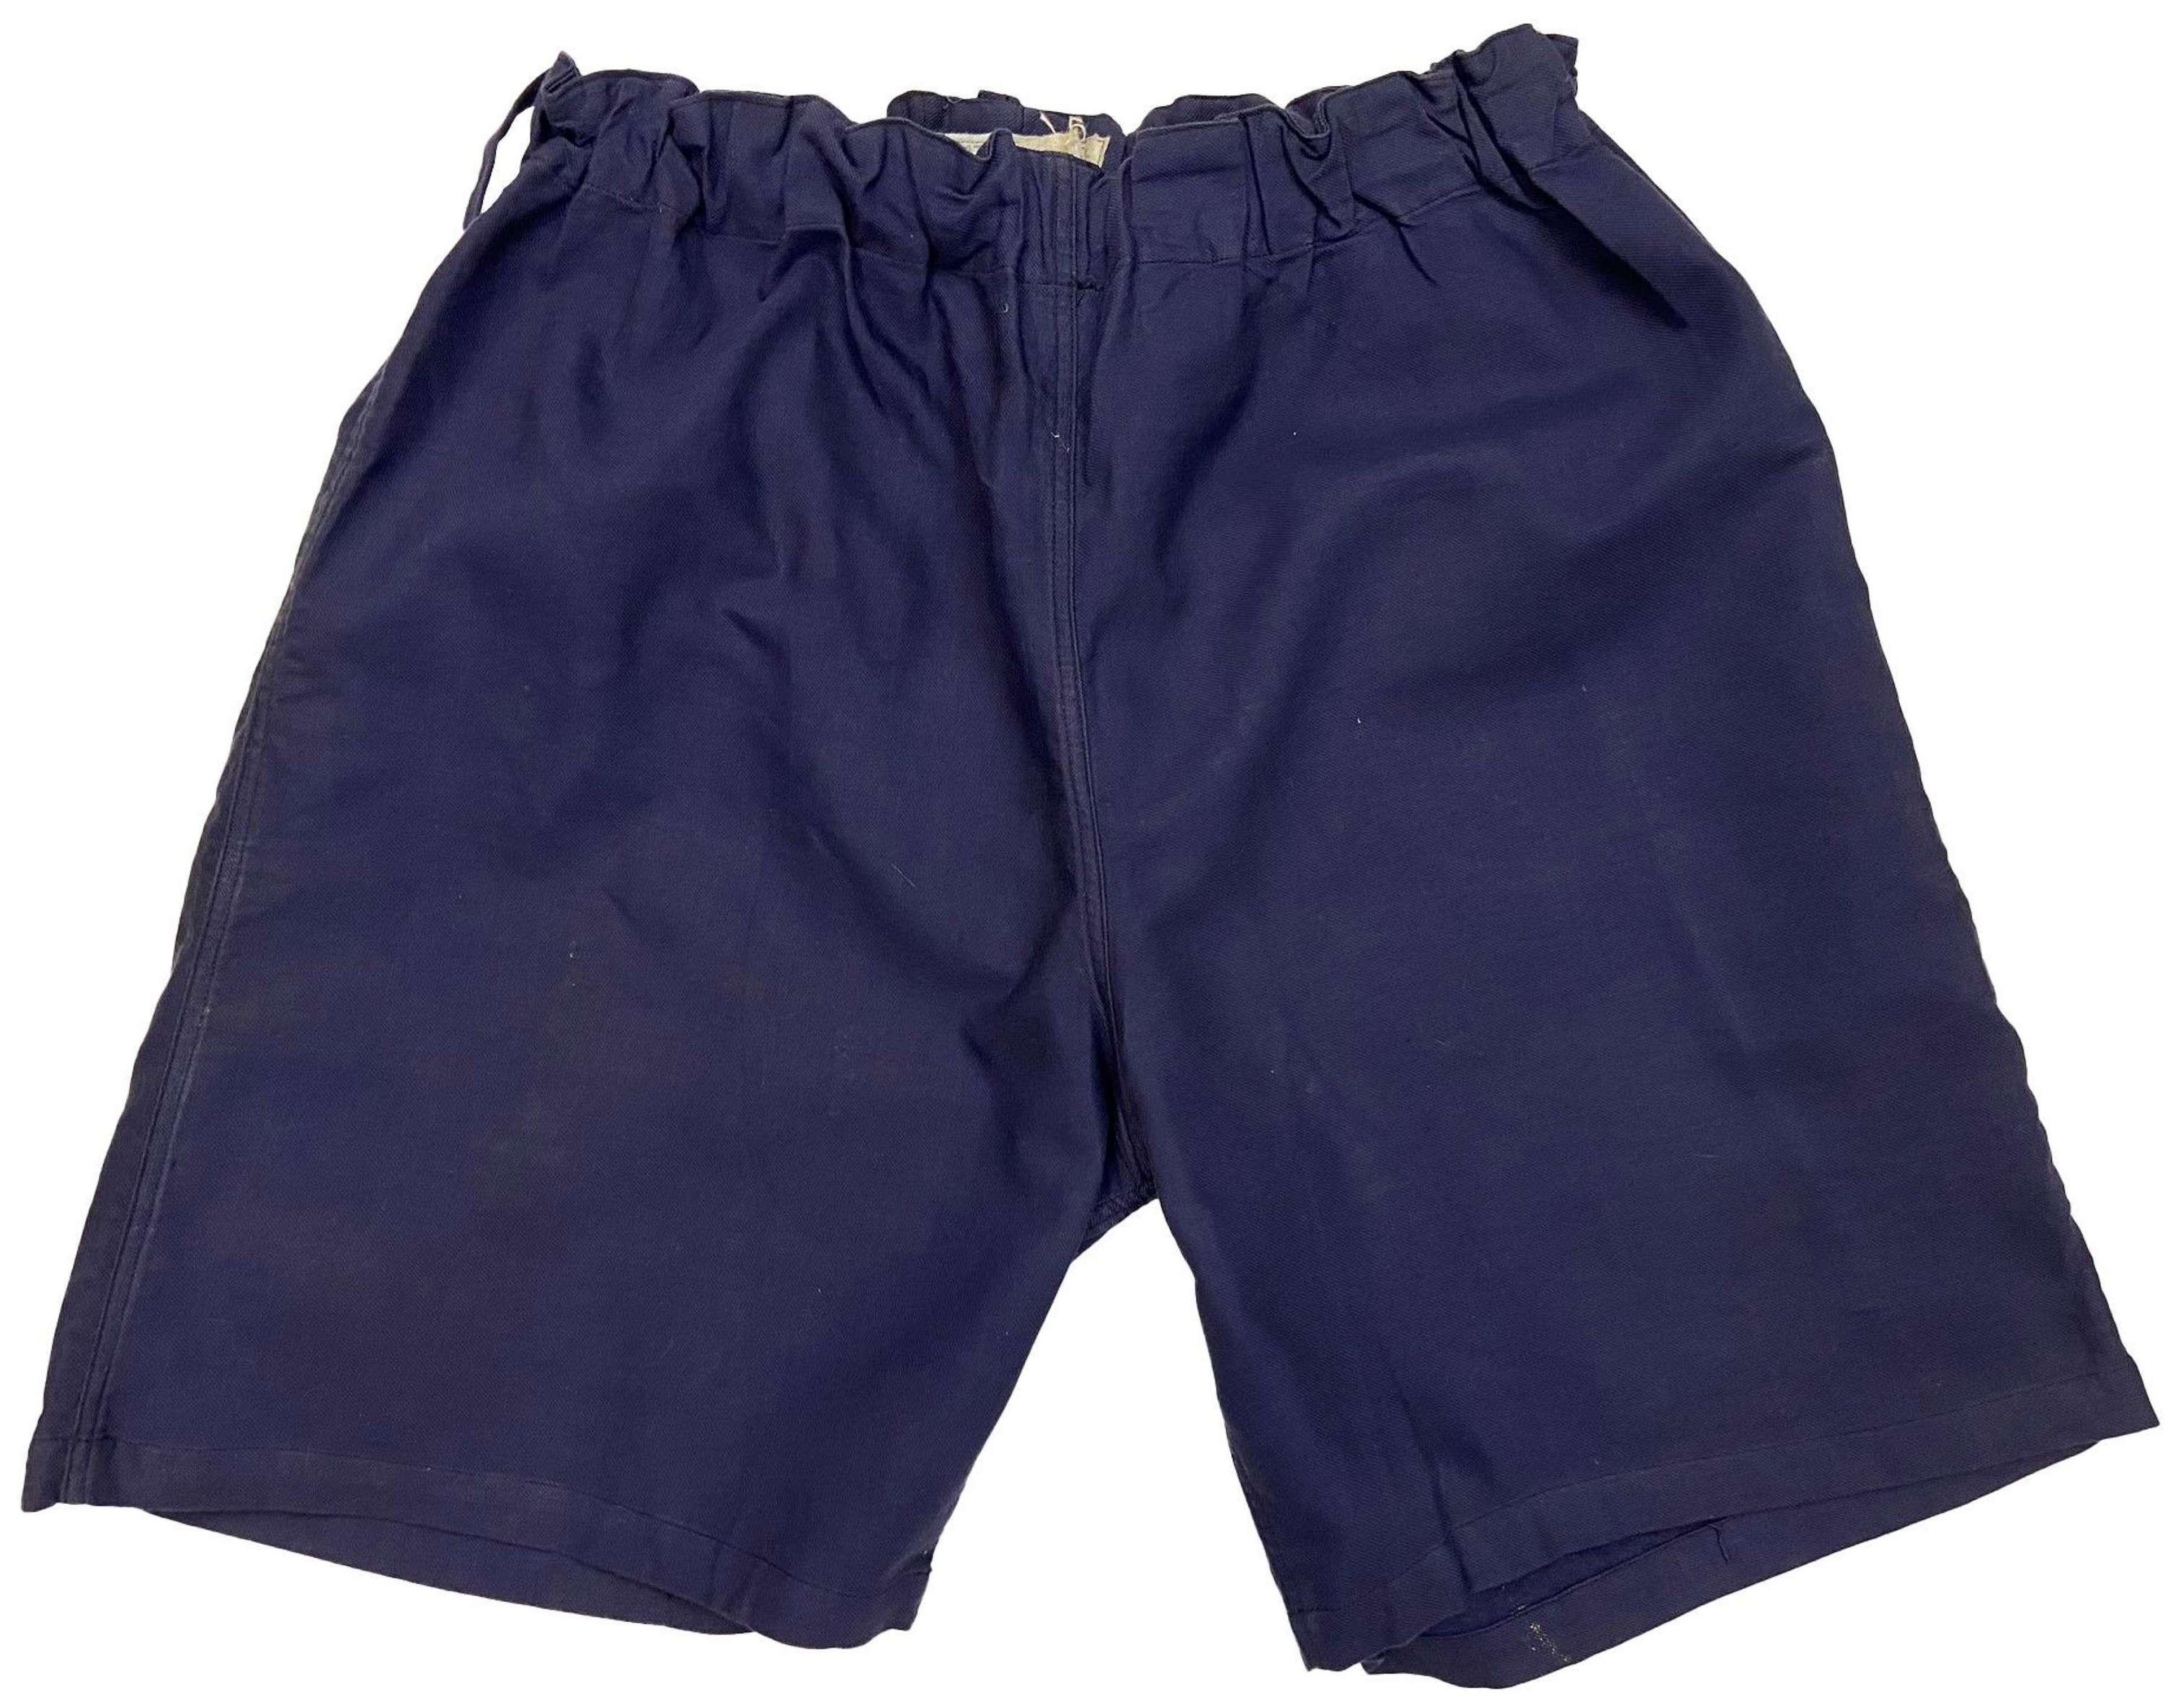 Scarce 1937 Dated RAF Physical Training Shorts (2)